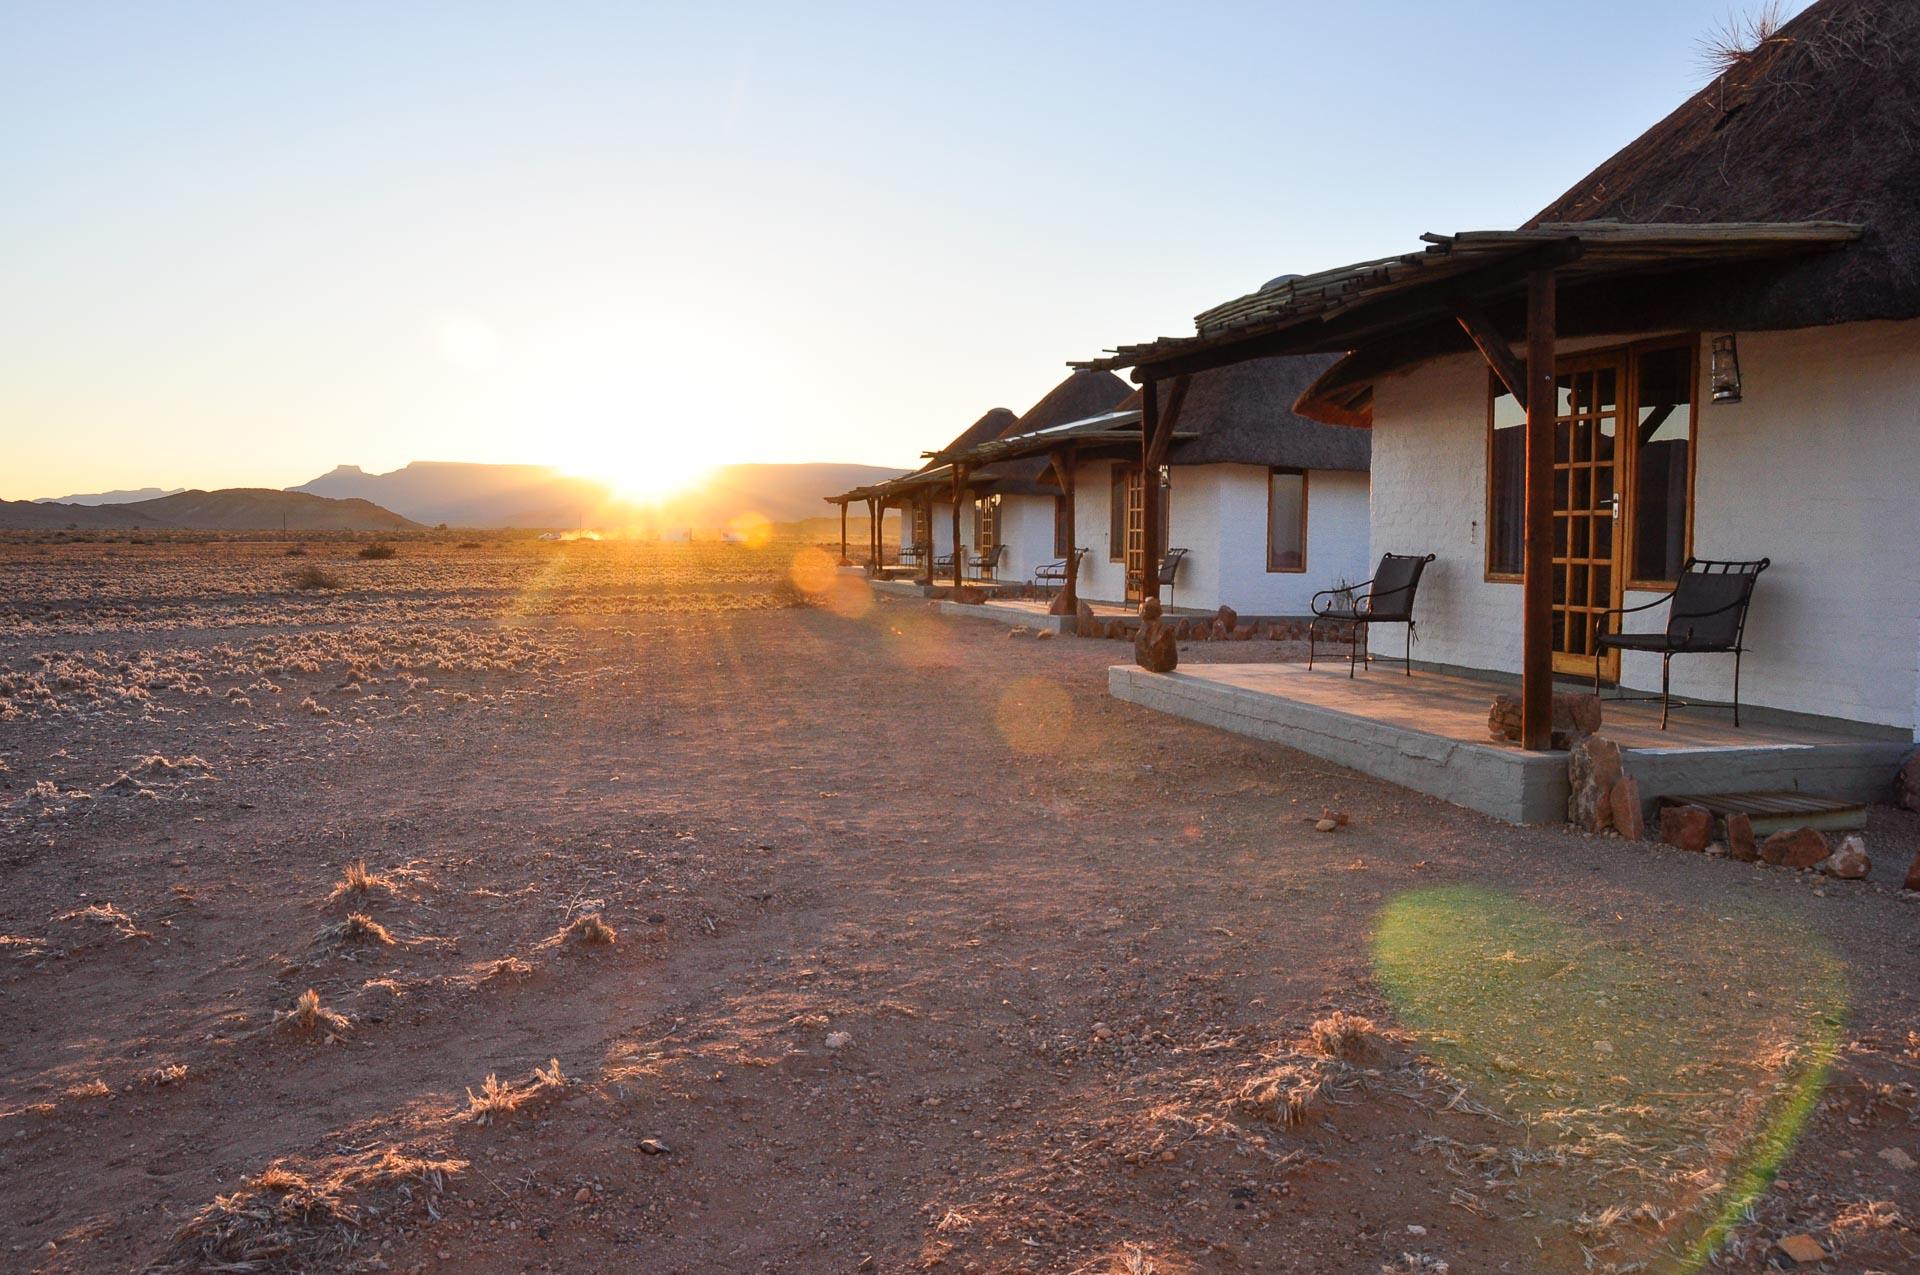 Deser-Homestead-Namibia-Globetrotter-Select-7